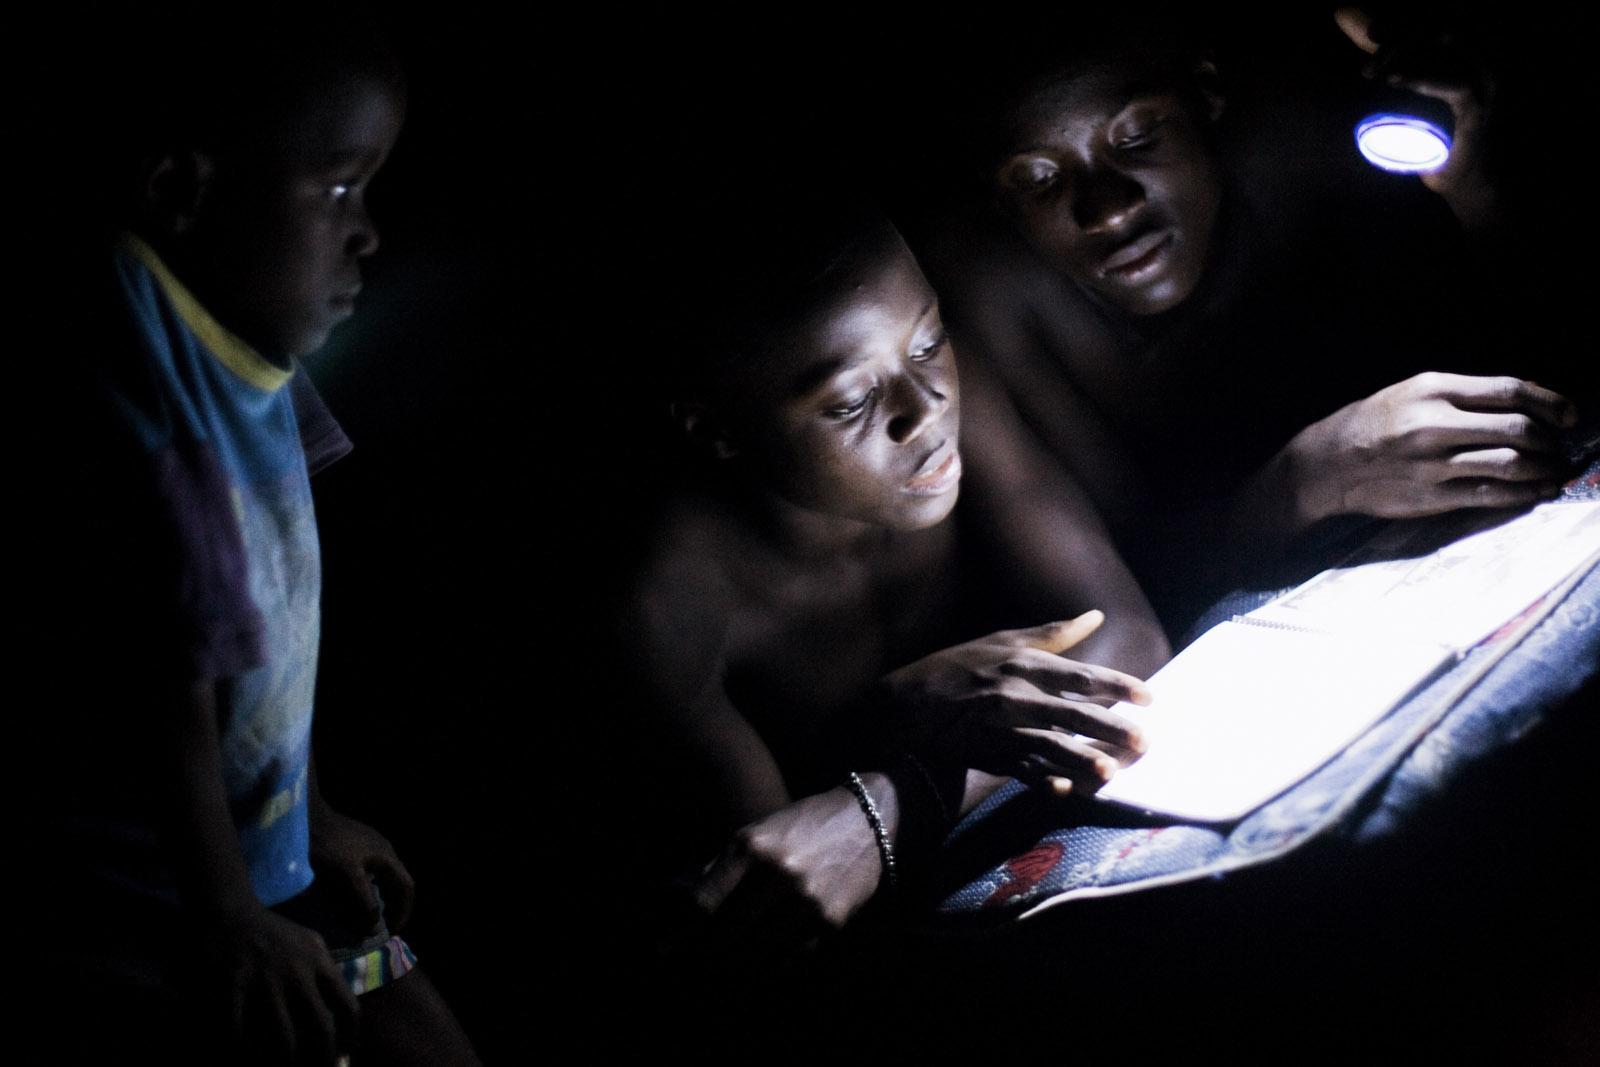 liberia-refugies-ivoiriens-0311-0833hd